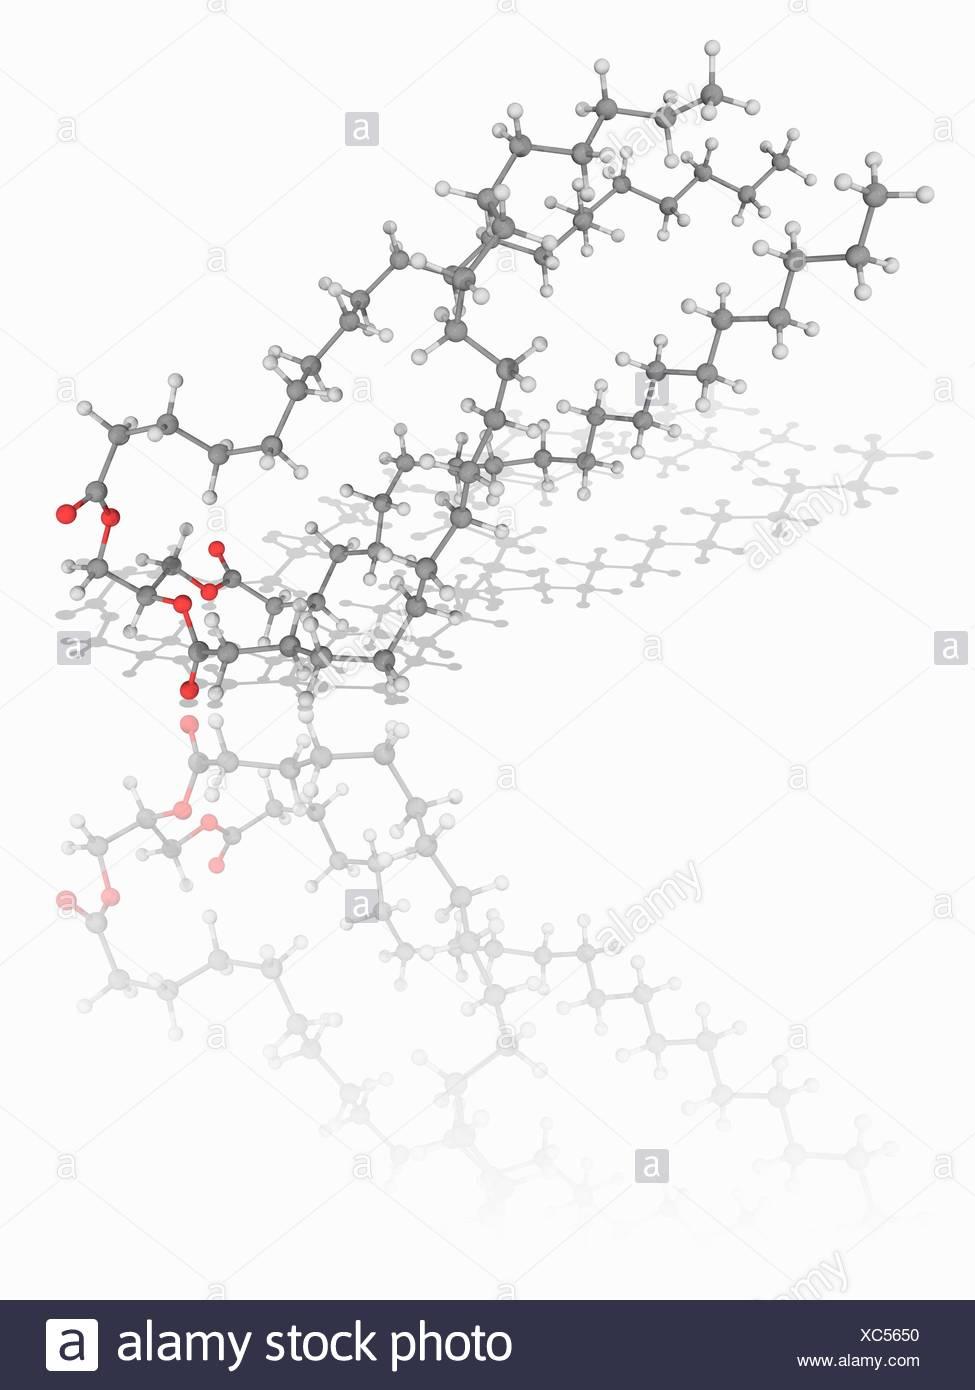 Triglyceride stock photos triglyceride stock images alamy molecular model of the triglyceride organic compound glycerol triarachidate c63 pooptronica Gallery